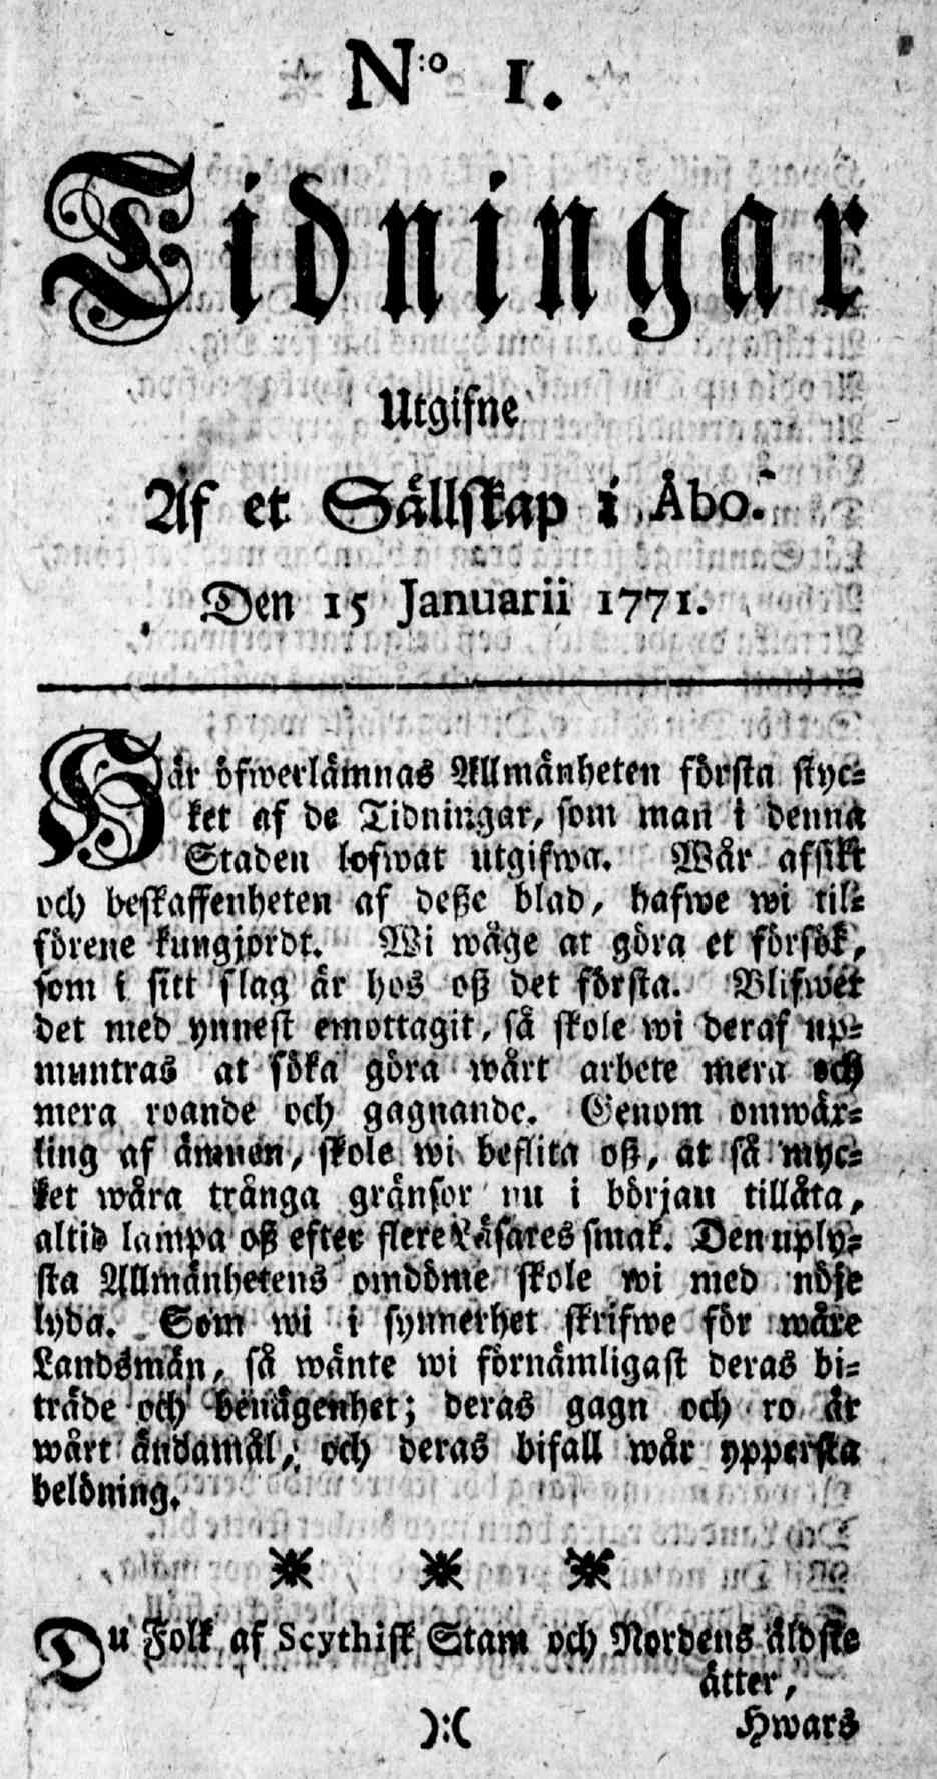 Tidningar Utgifne af et Sällskap i Åbo, 15.1.1771, nro 1, sivu 1